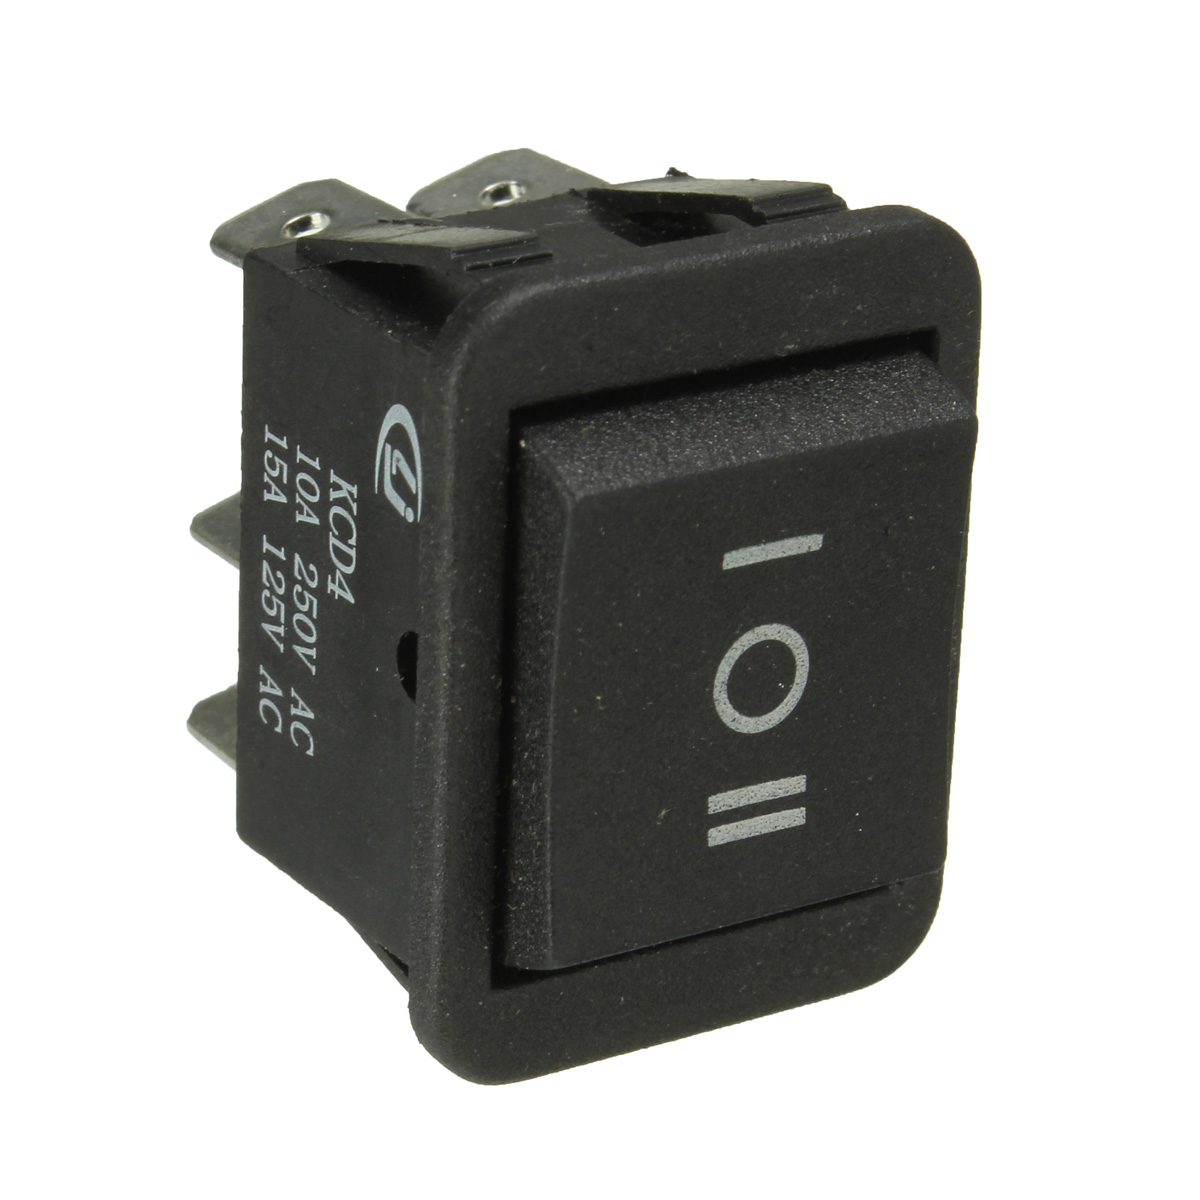 6 Pin Auto On/Off/On Momentary Power Window Rocker Switch ...